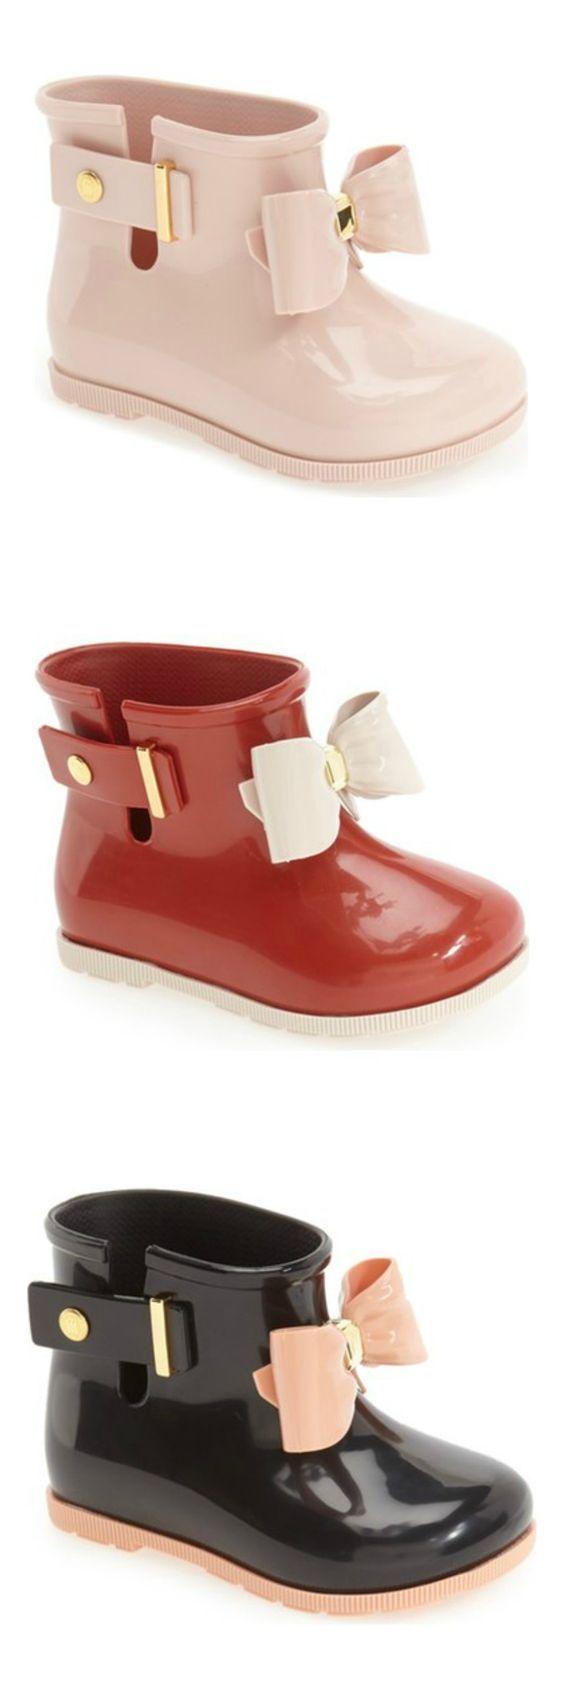 rain boots - way too cute!                                                                                                                                                                                 More